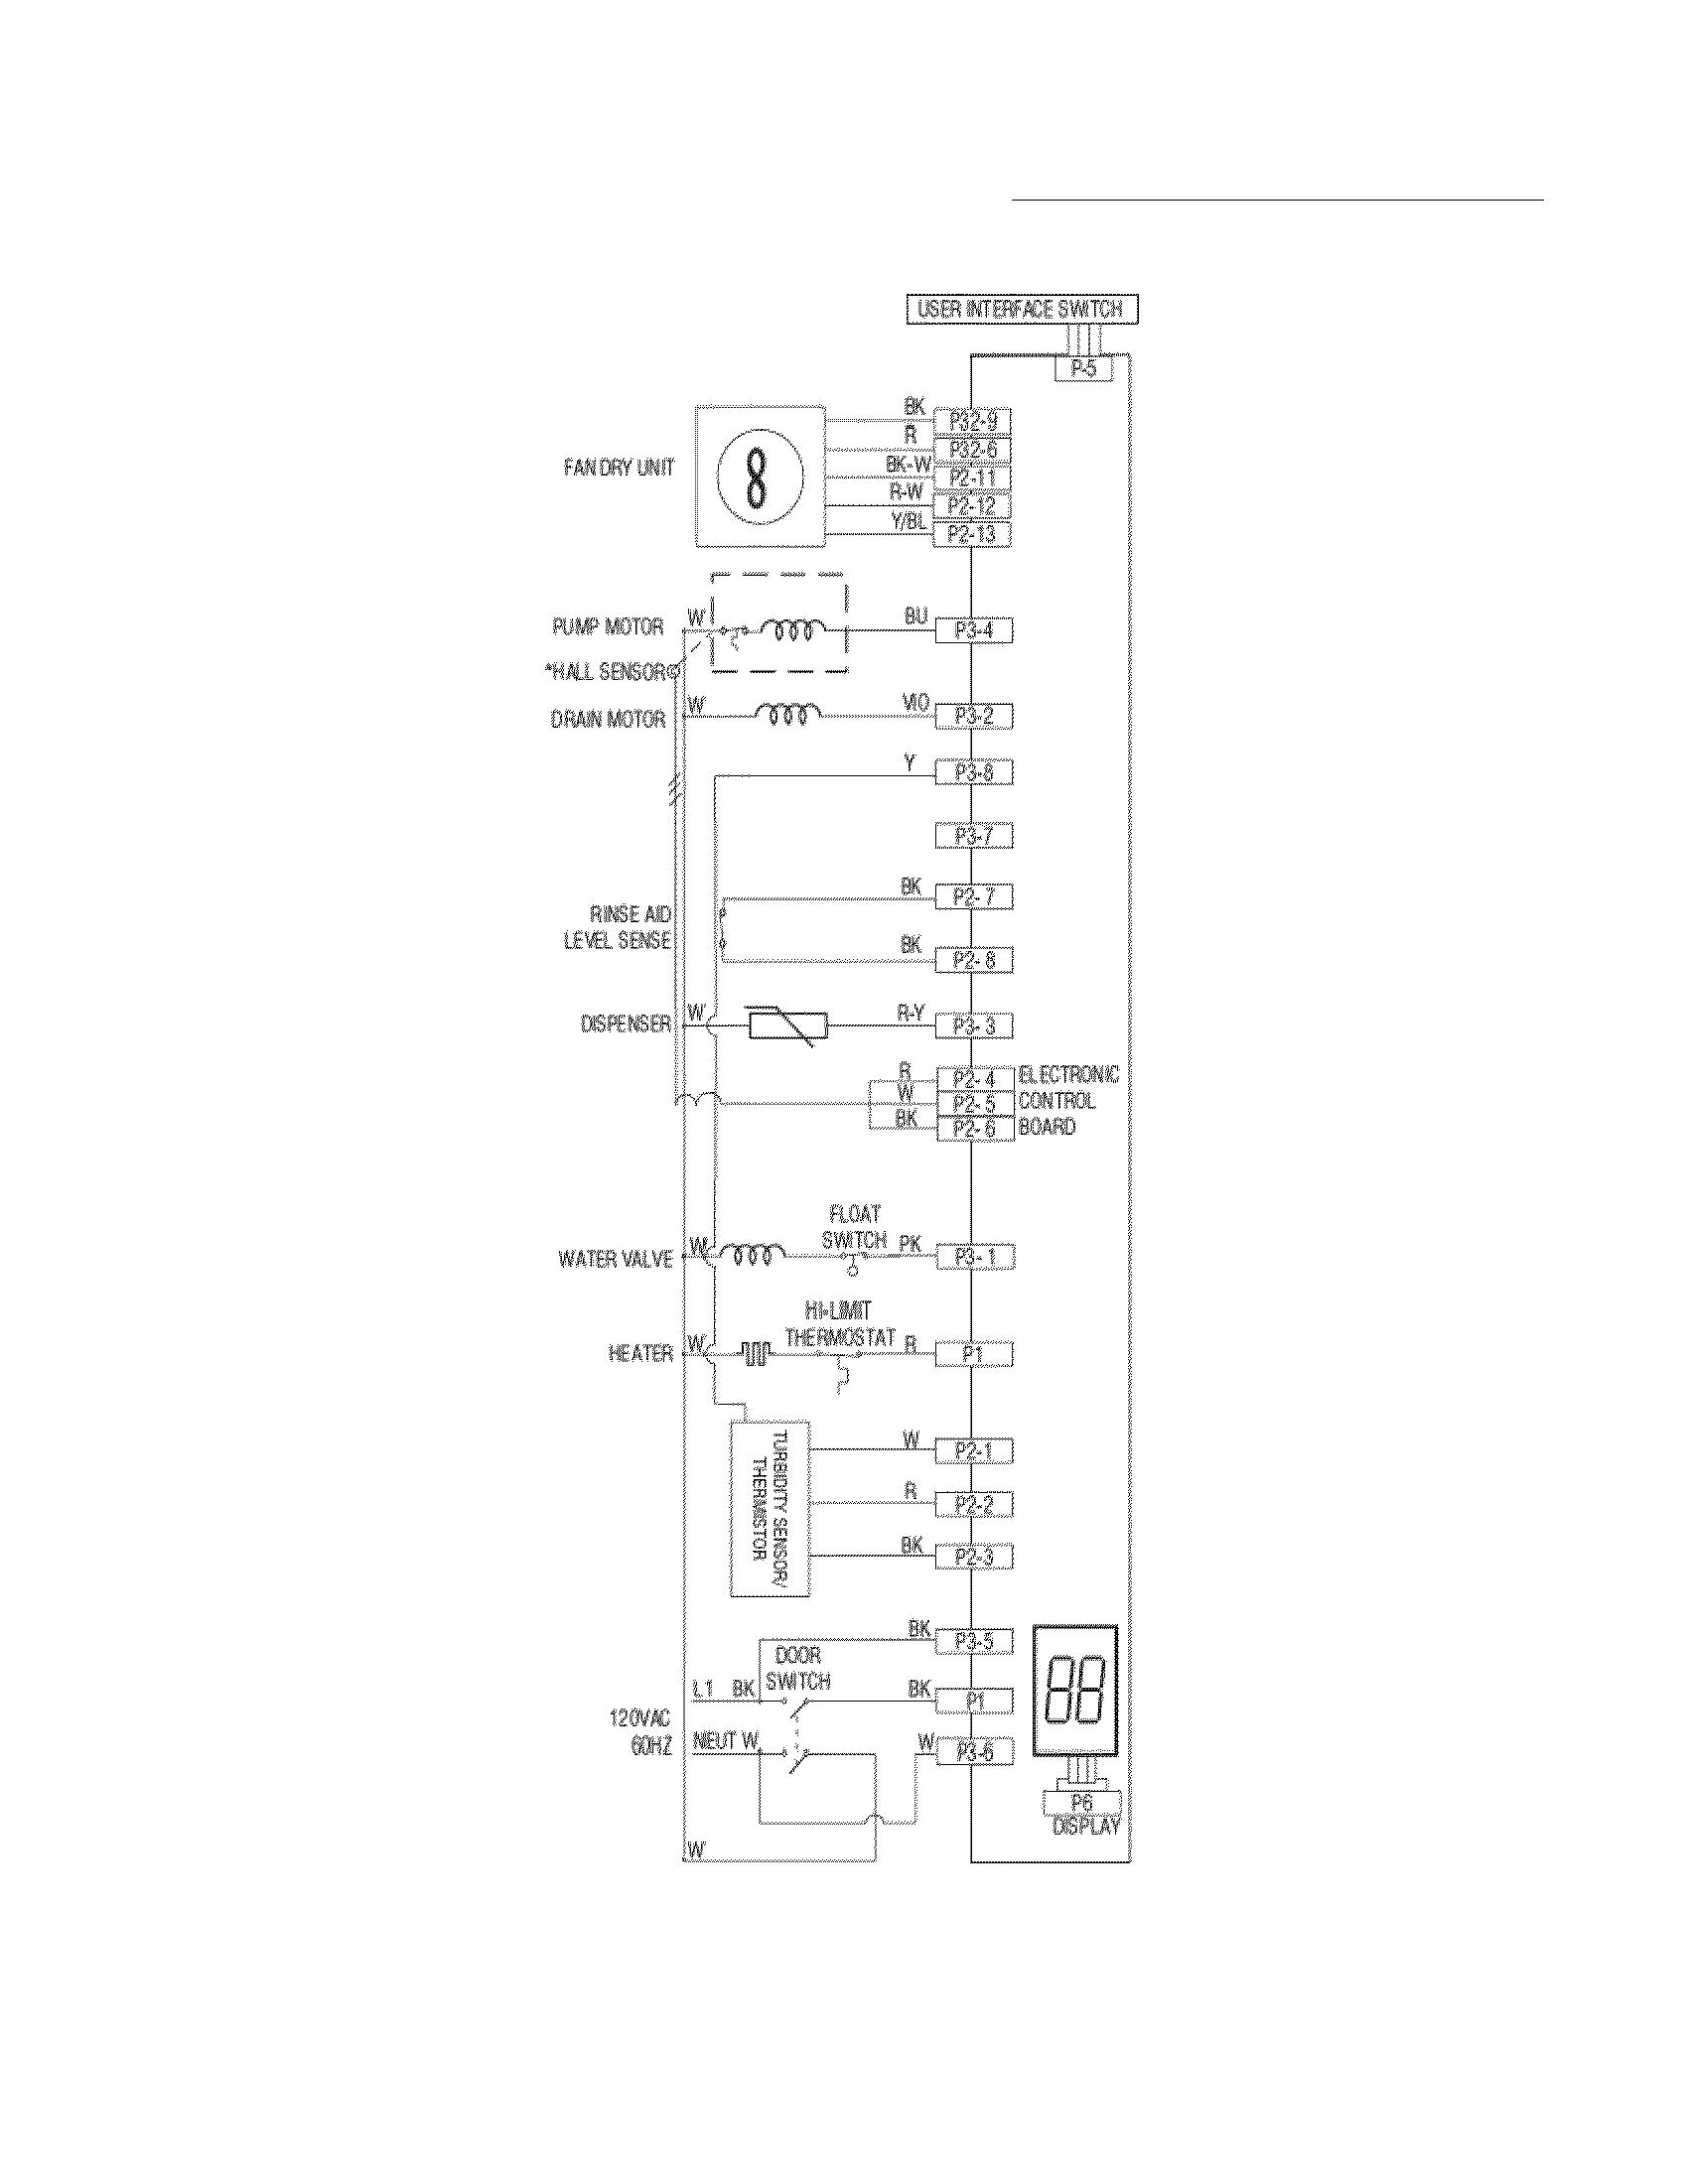 frigidaire dishwasher wiring diagram